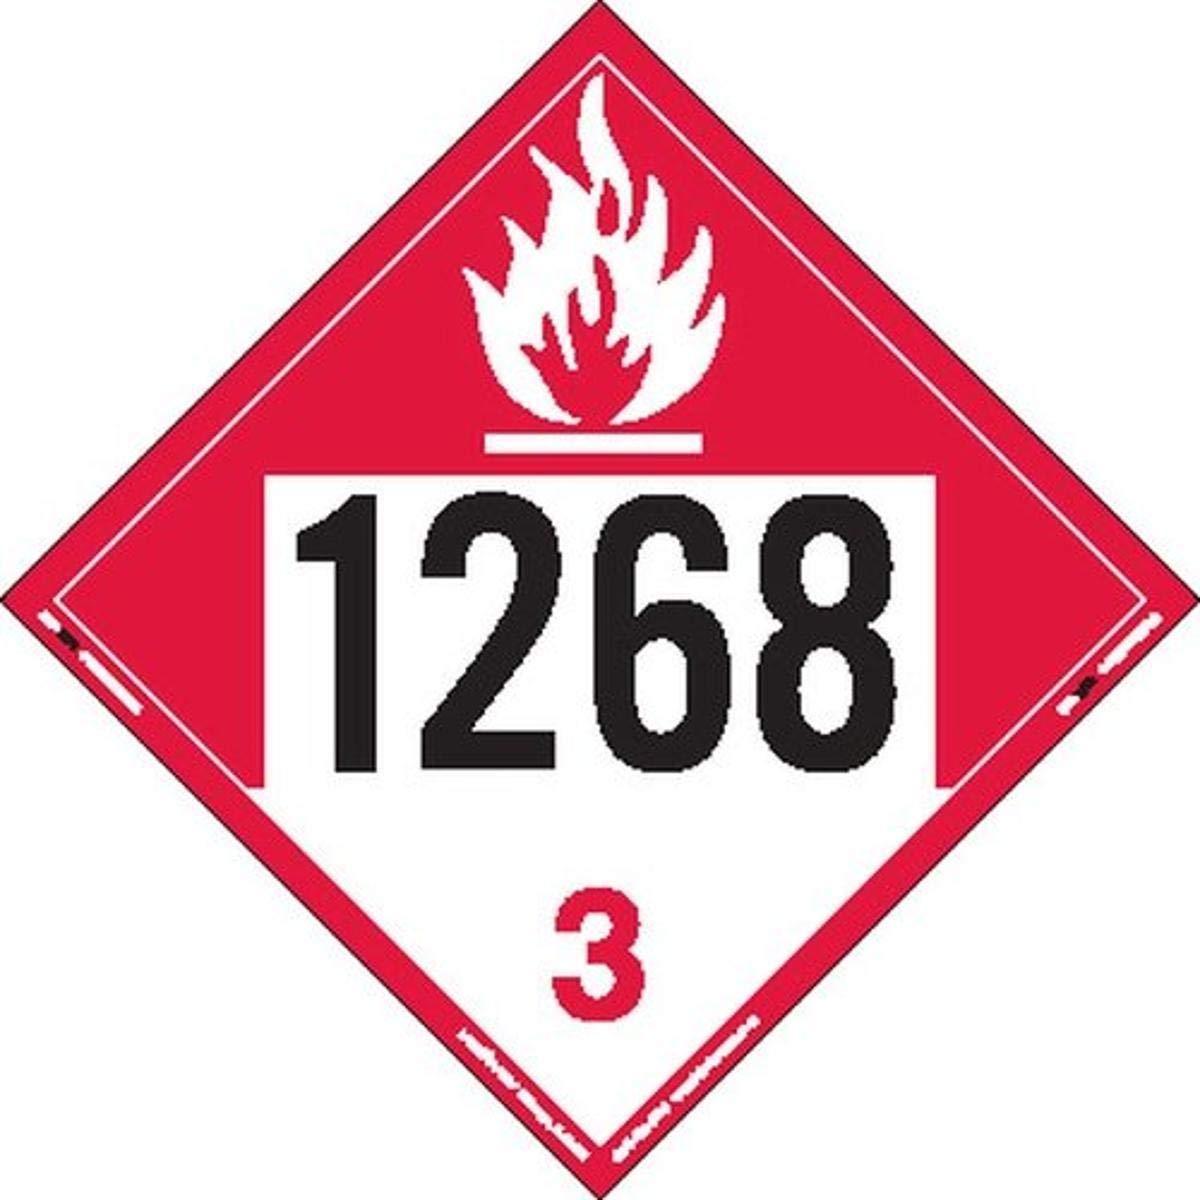 Labelmaster ZT9-1268 UN store 1268 Placard Sale special price Combustible Hazmat Liquid